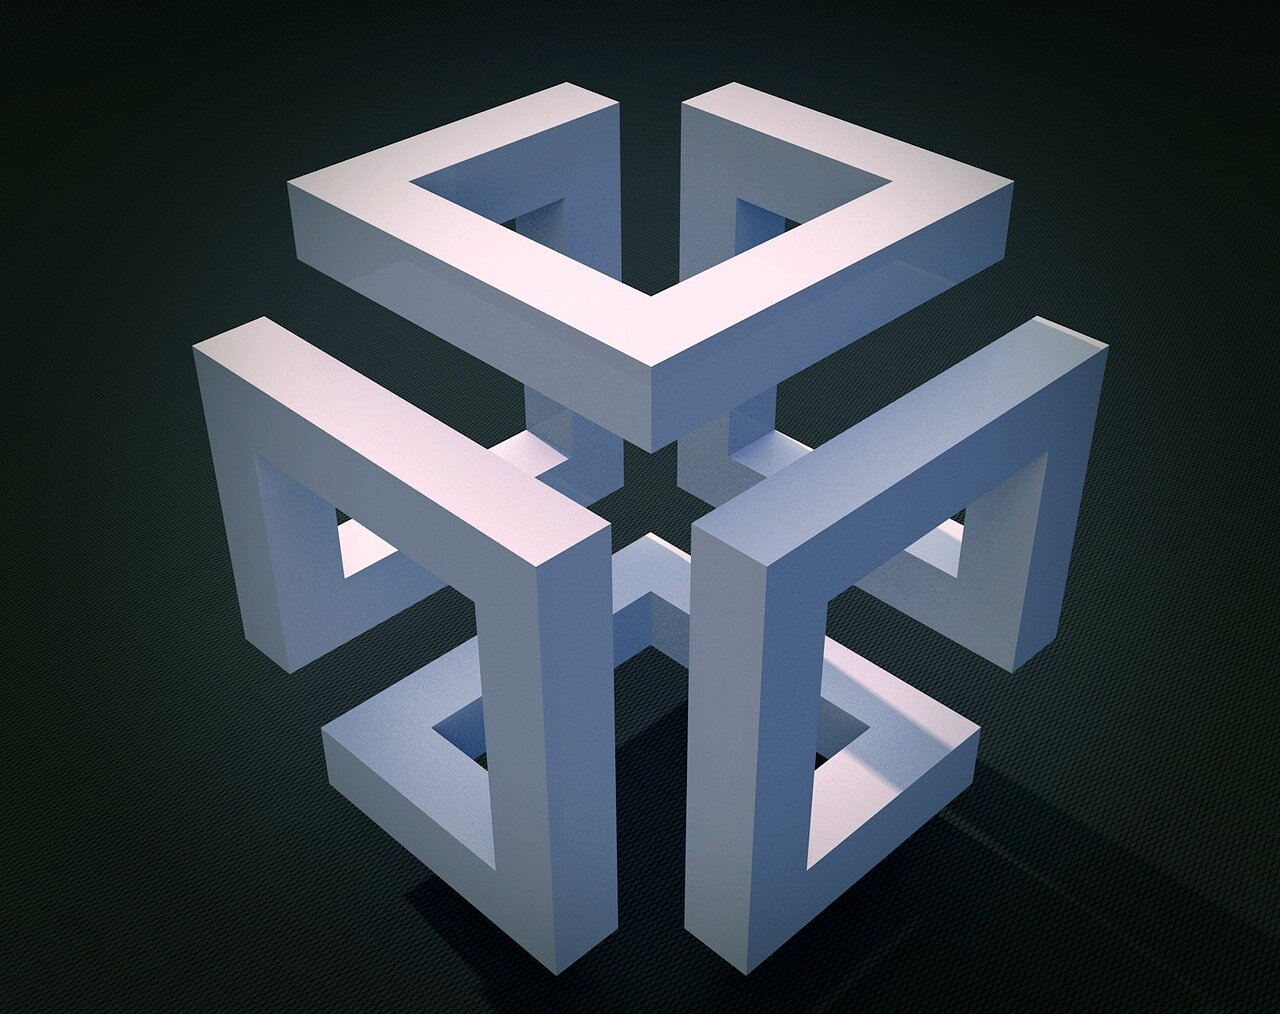 cube-2366515_1280.jpg